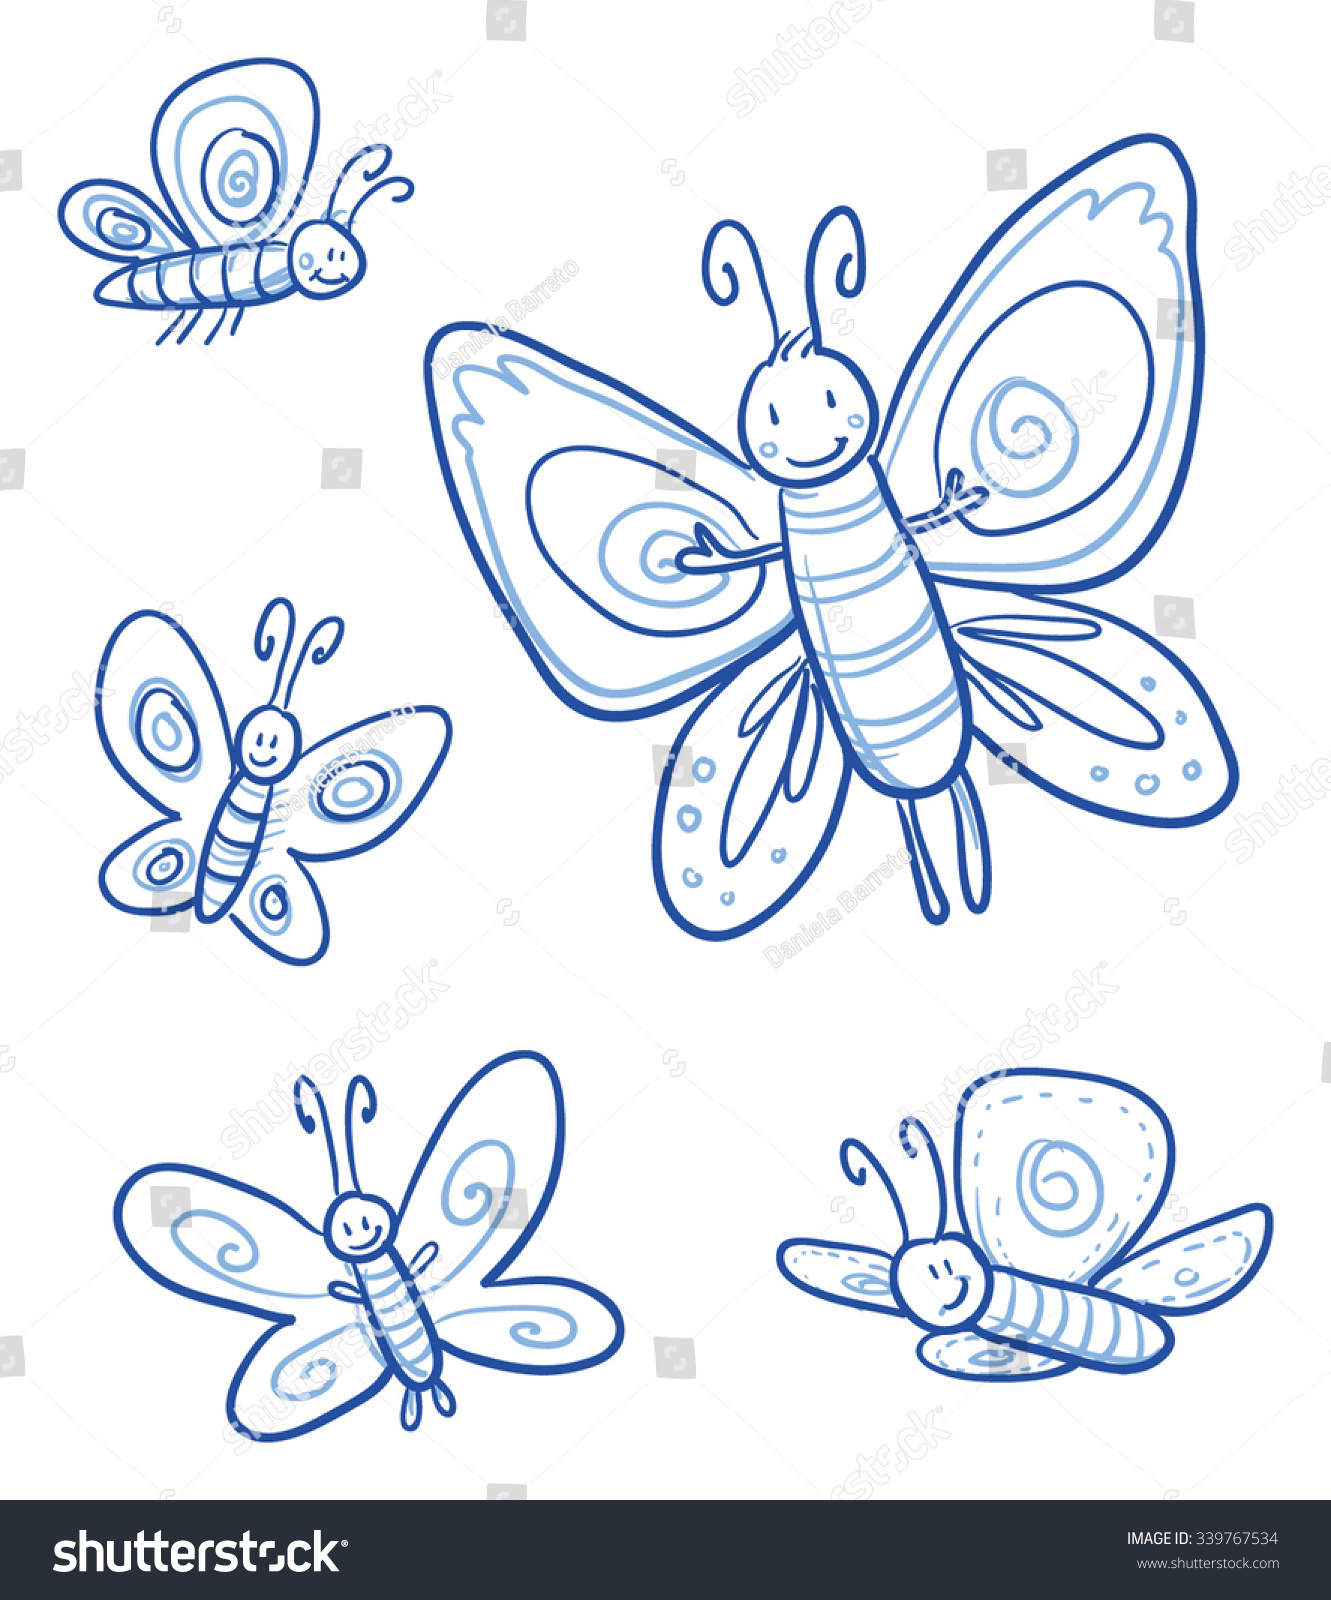 Uncategorized Images Of Butterflies For Children set different cute little cartoon butterflies stock vector of for children or baby shower cards hand